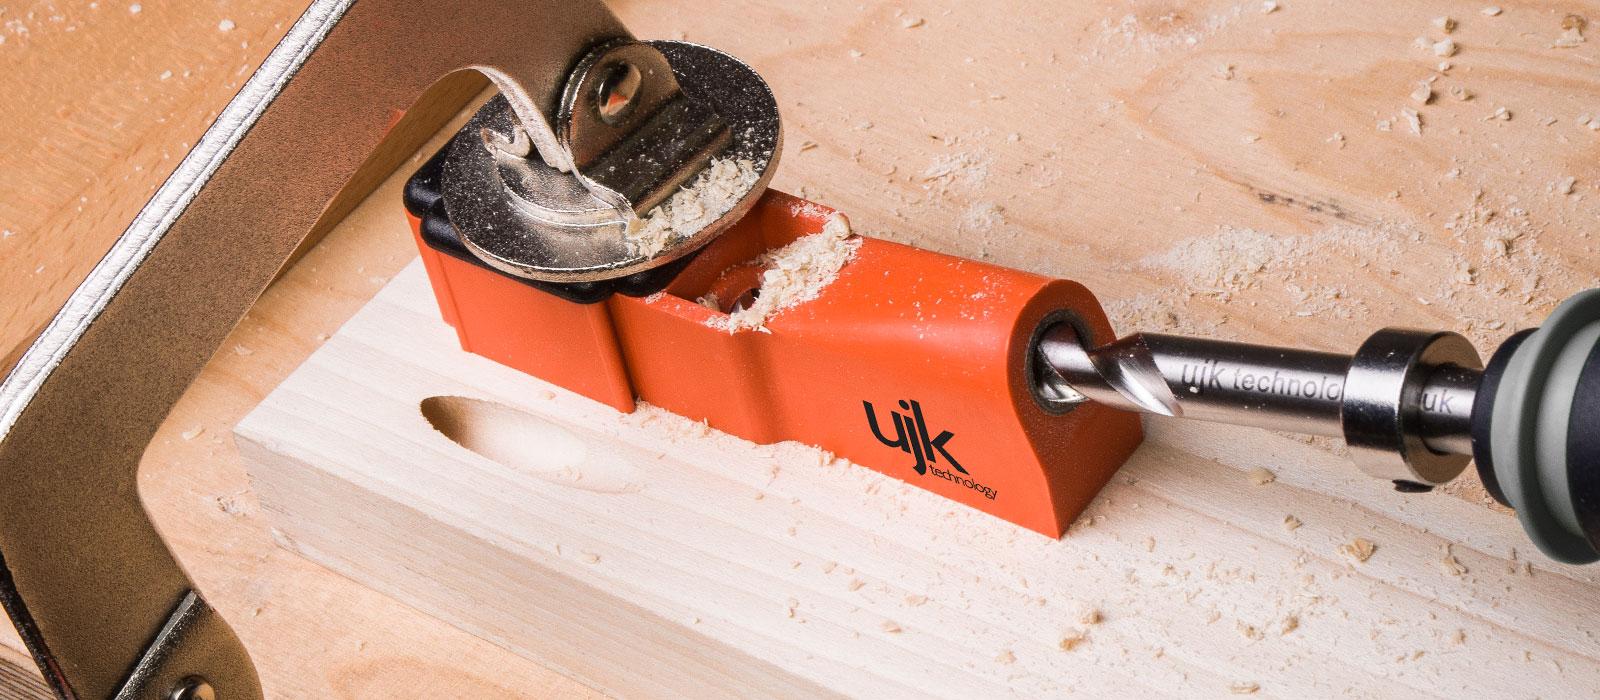 UJK Technology Mini Pocket Hole Jig